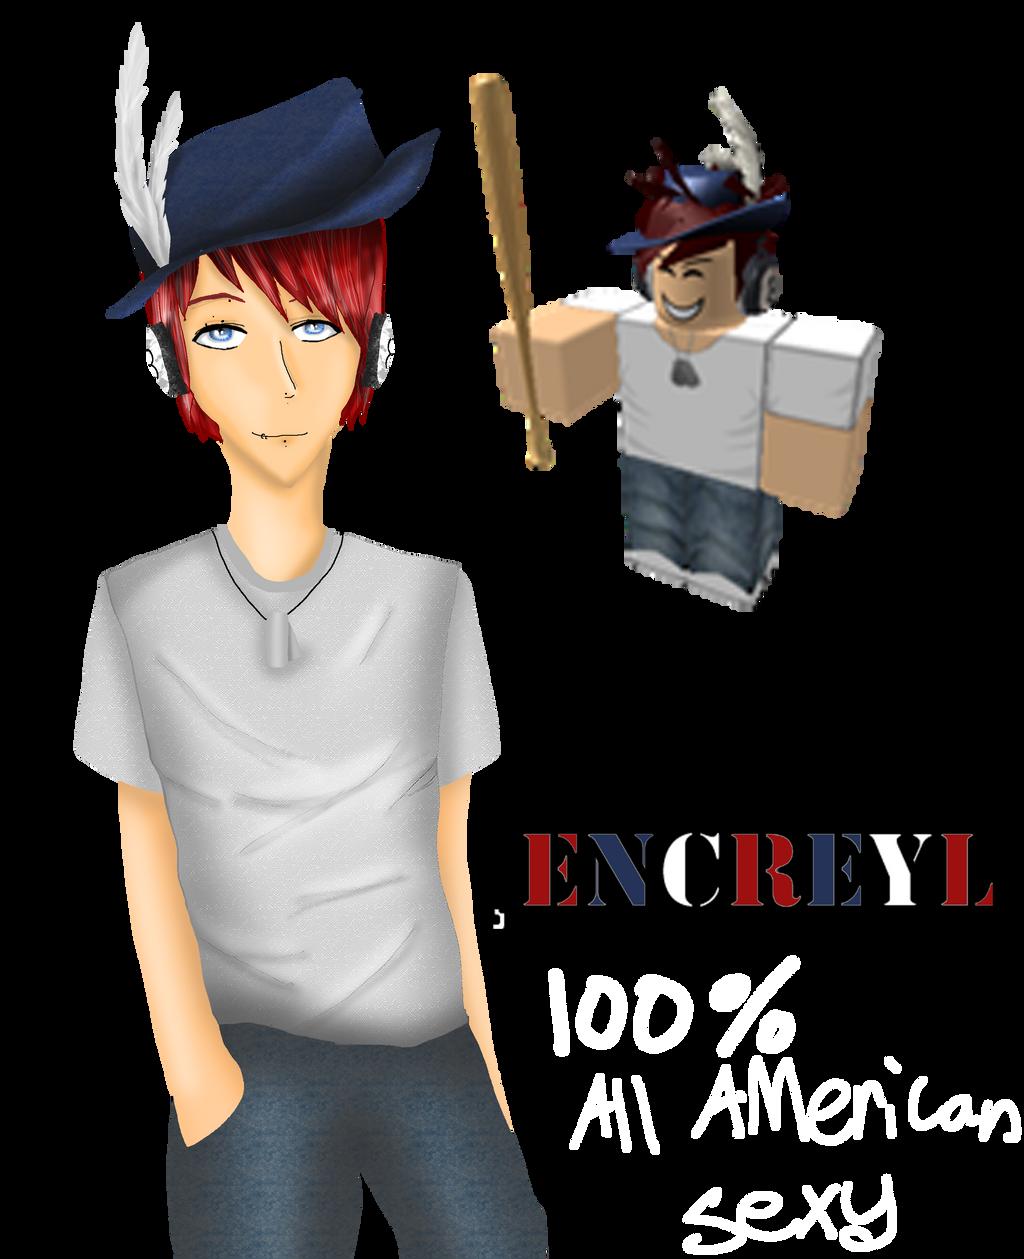 Encreyl DrawingEncreyl By Encreyl-ROBLOX On DeviantArt